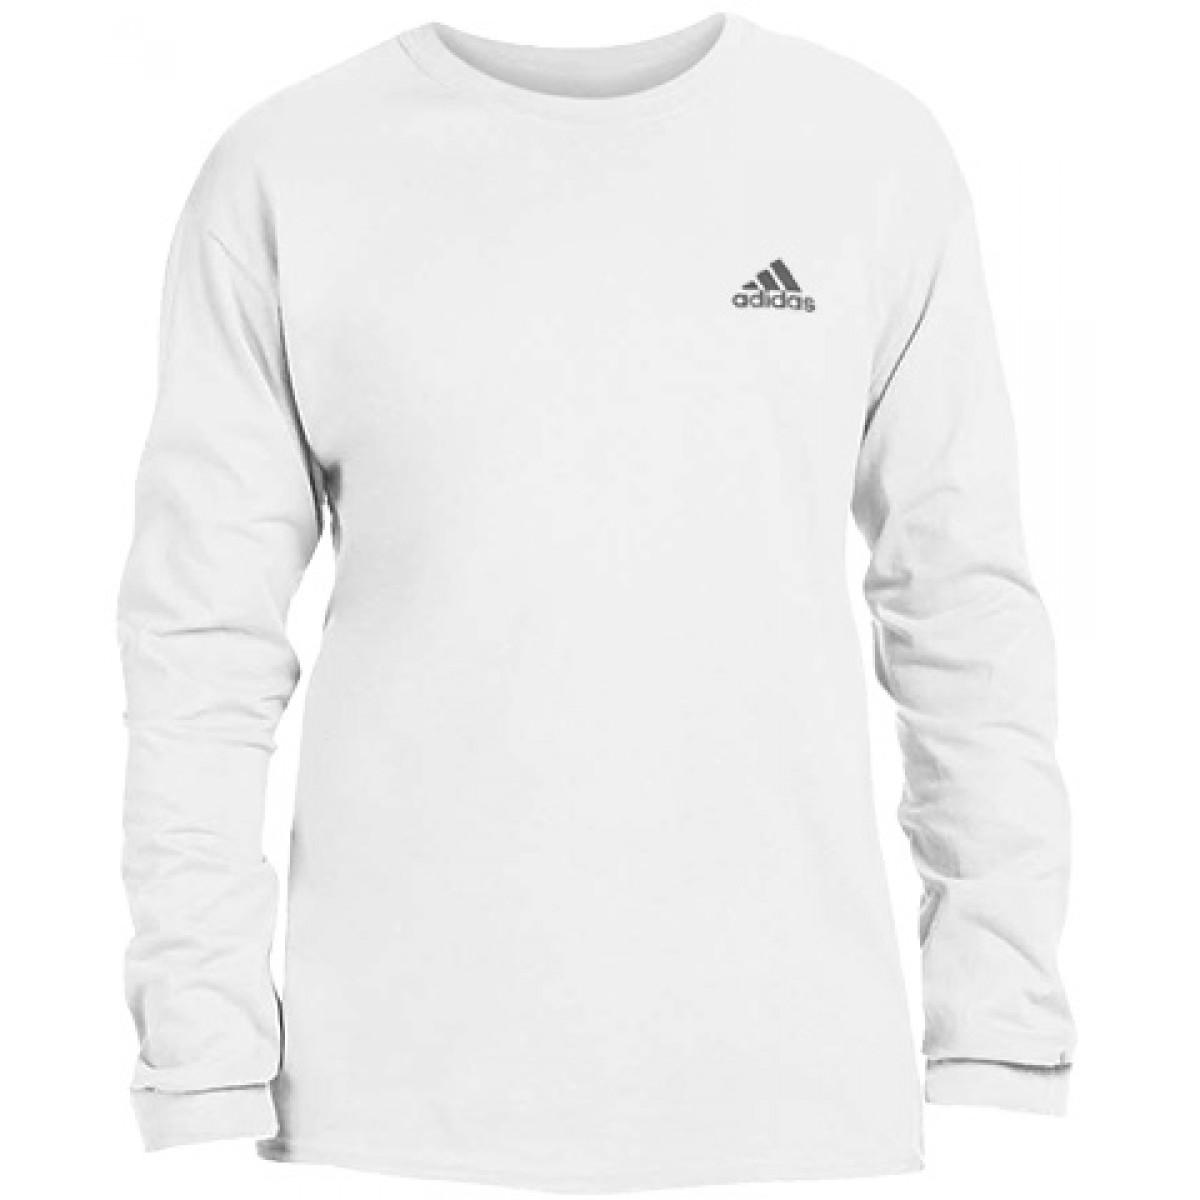 Men's Ultimate Long Sleeve Adidas Crew Tee